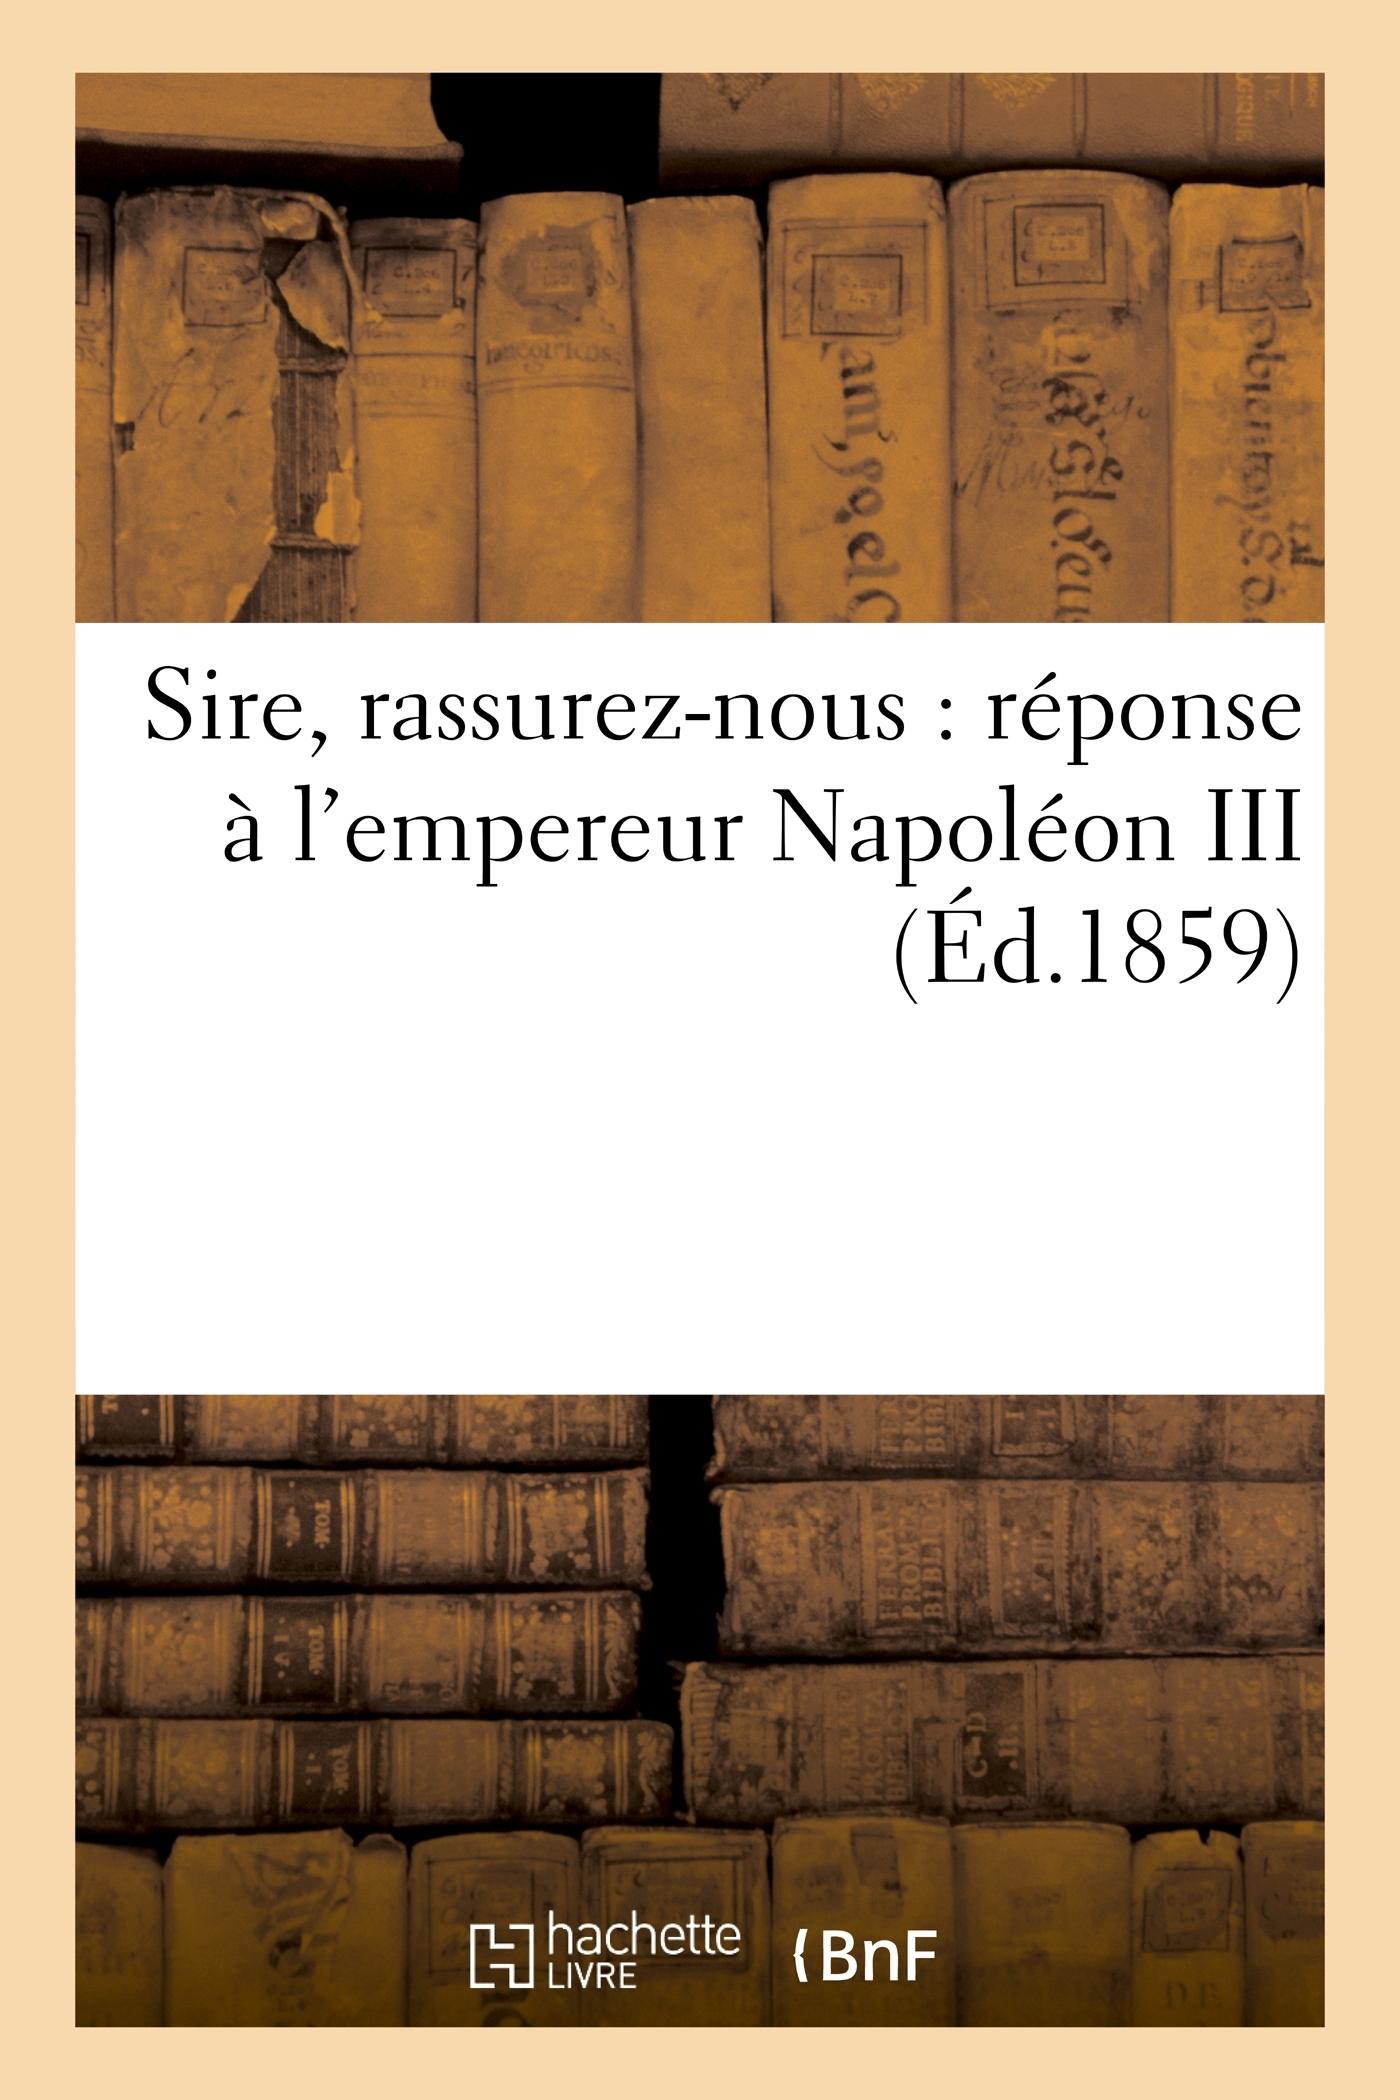 SIRE, RASSUREZ-NOUS : REPONSE A L'EMPEREUR NAPOLEON III